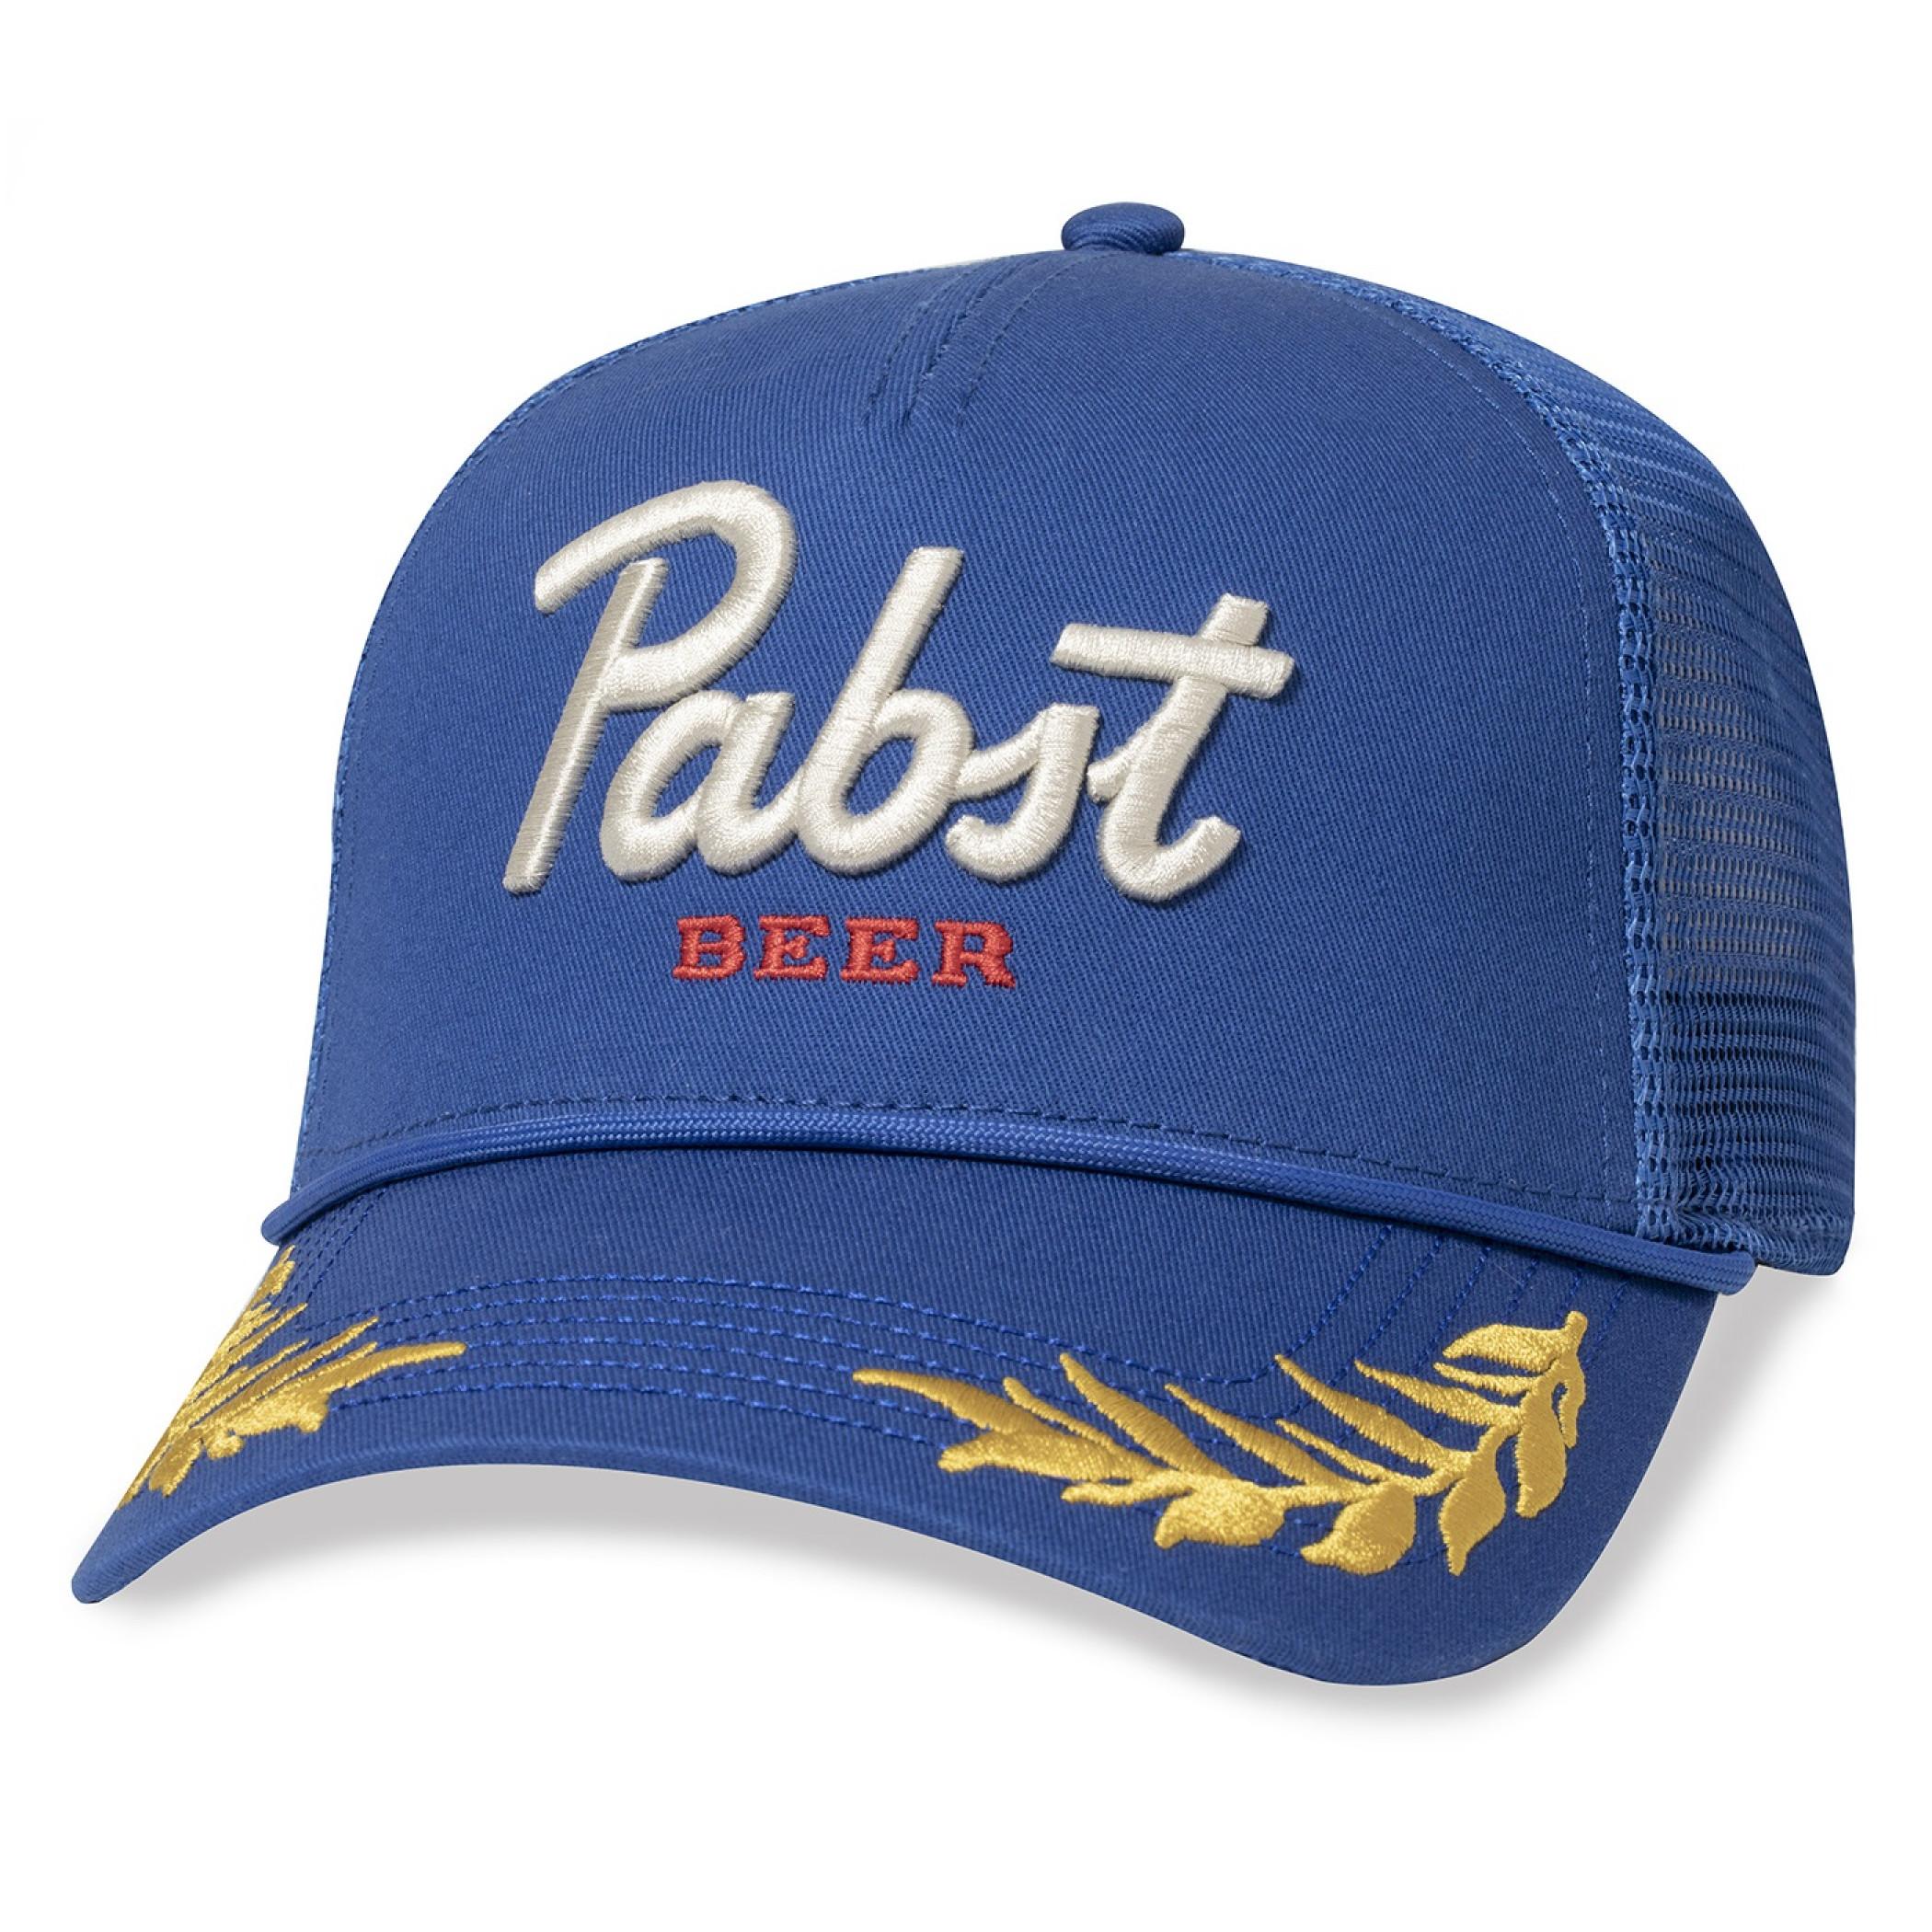 Pabst Beer The General Trucker Mesh Hat